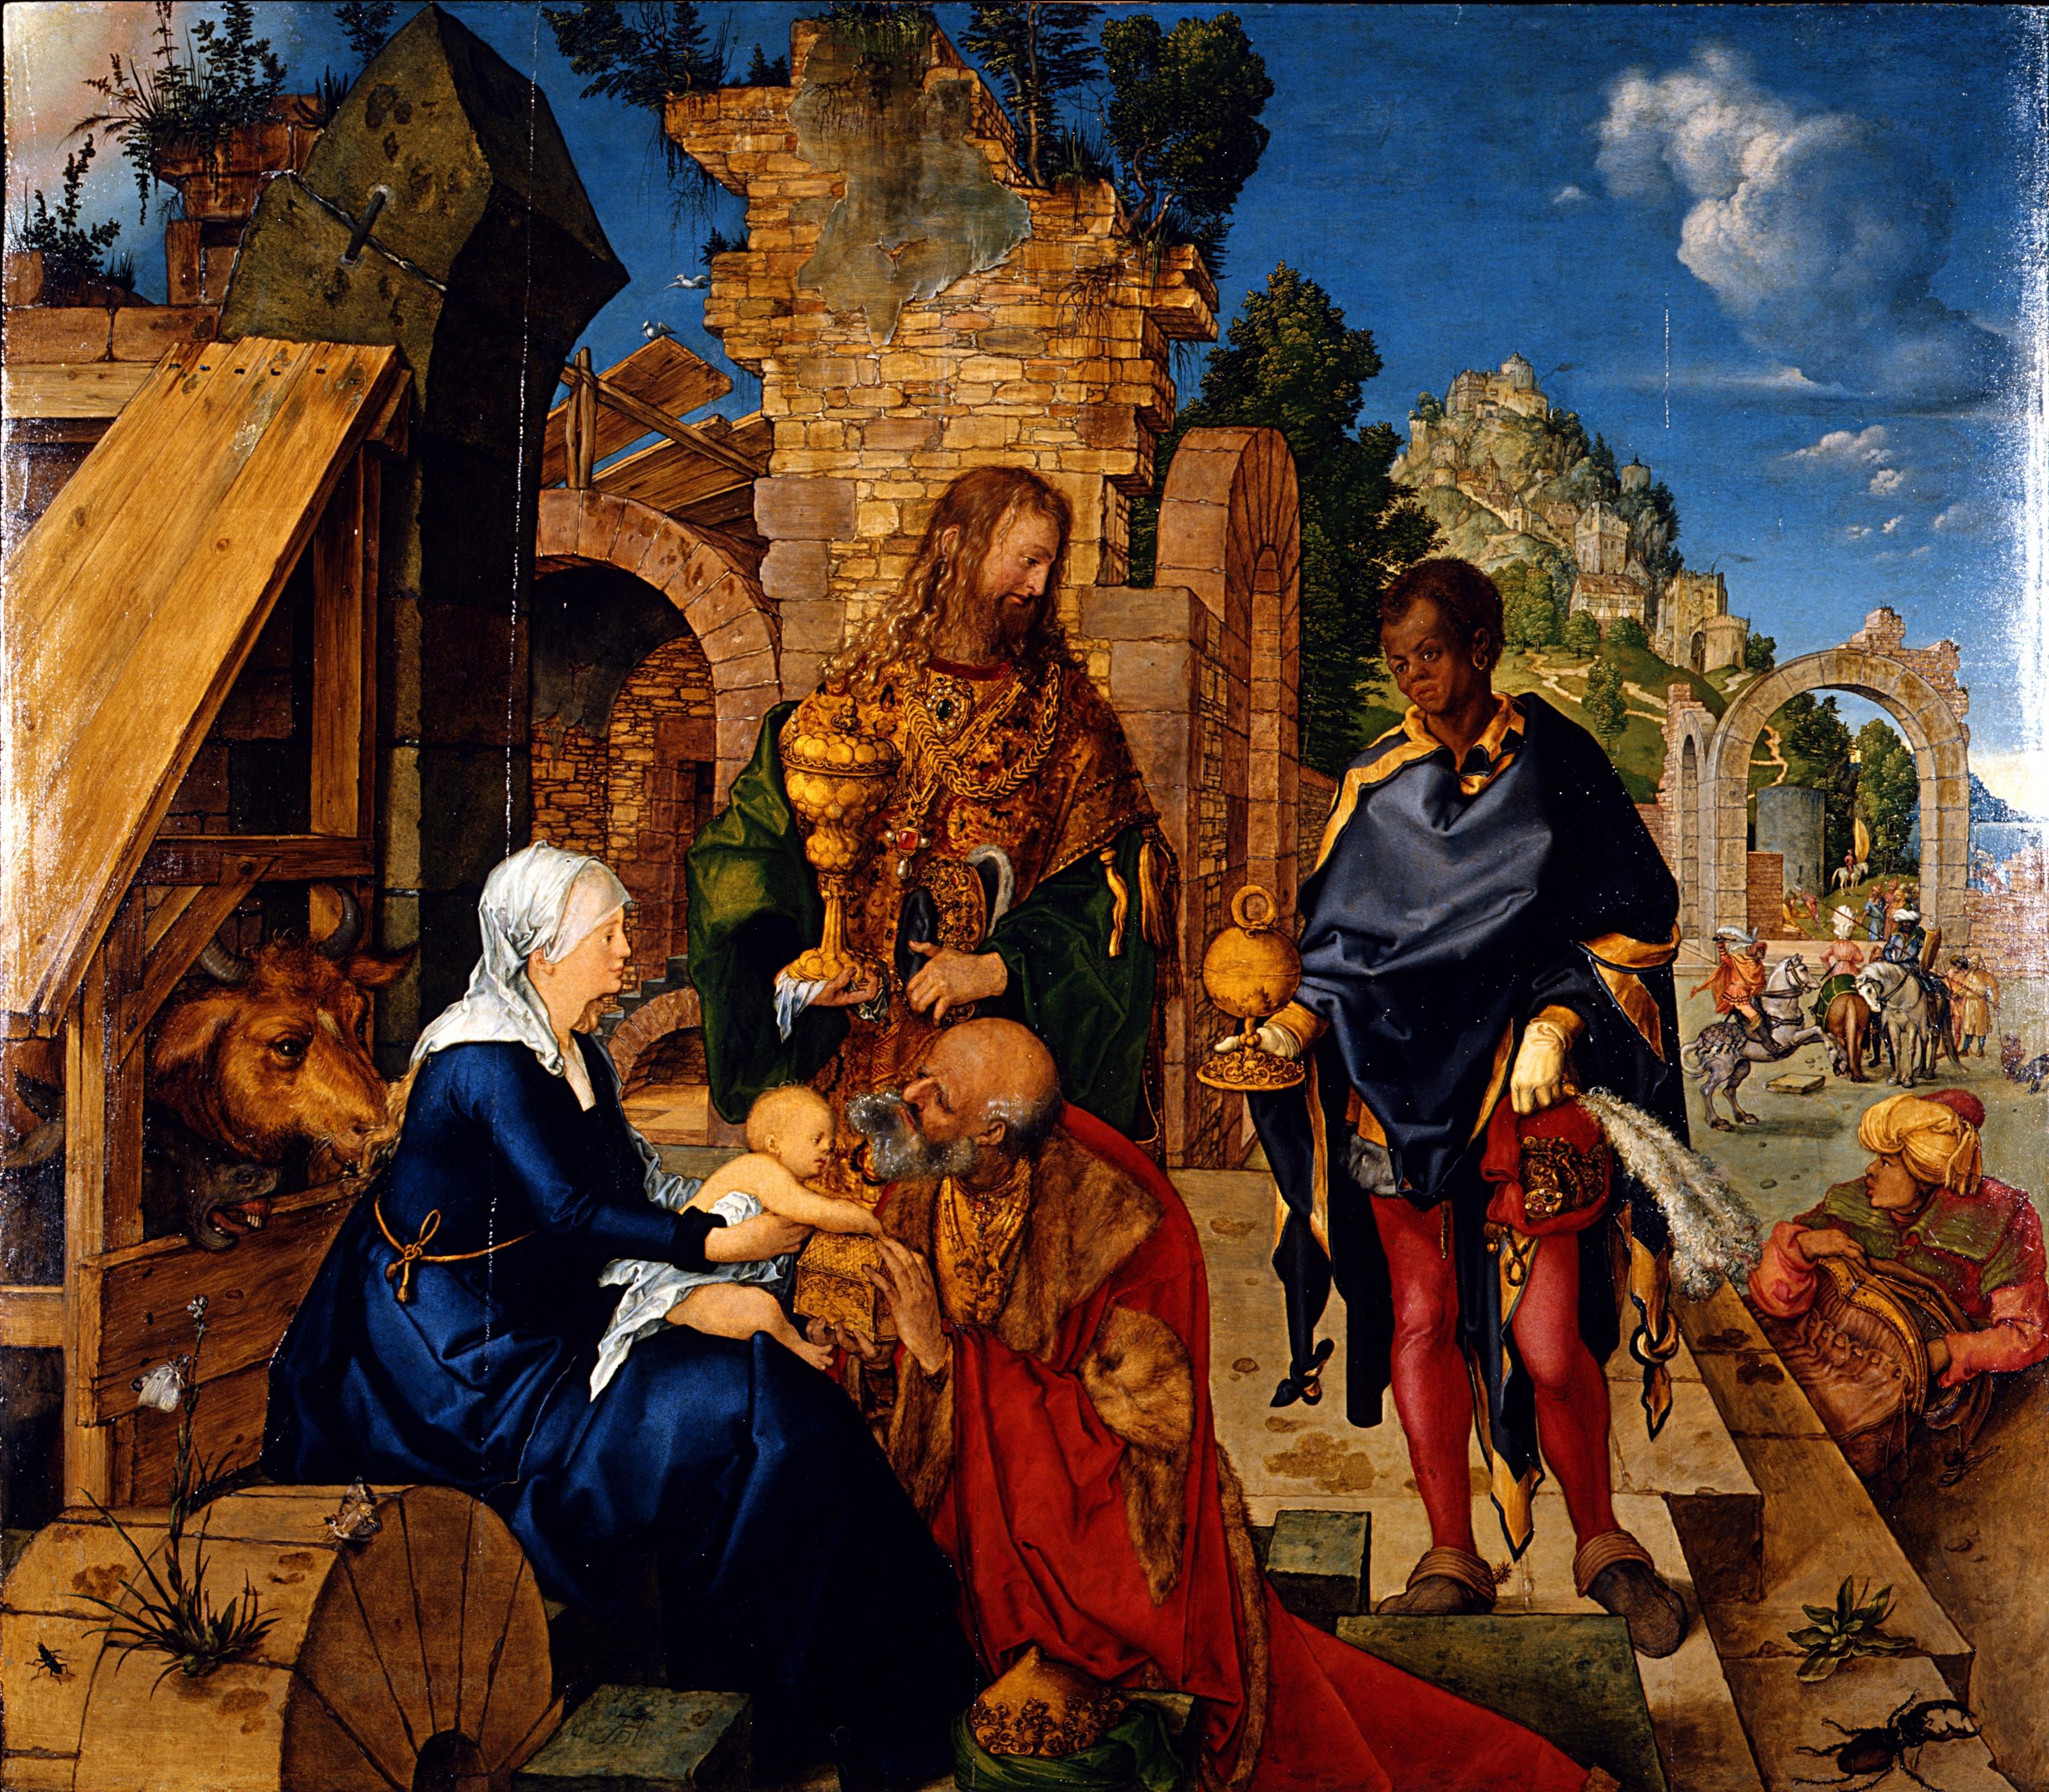 Albrecht-Dürer-Adoration-of-the-Magi-Painting